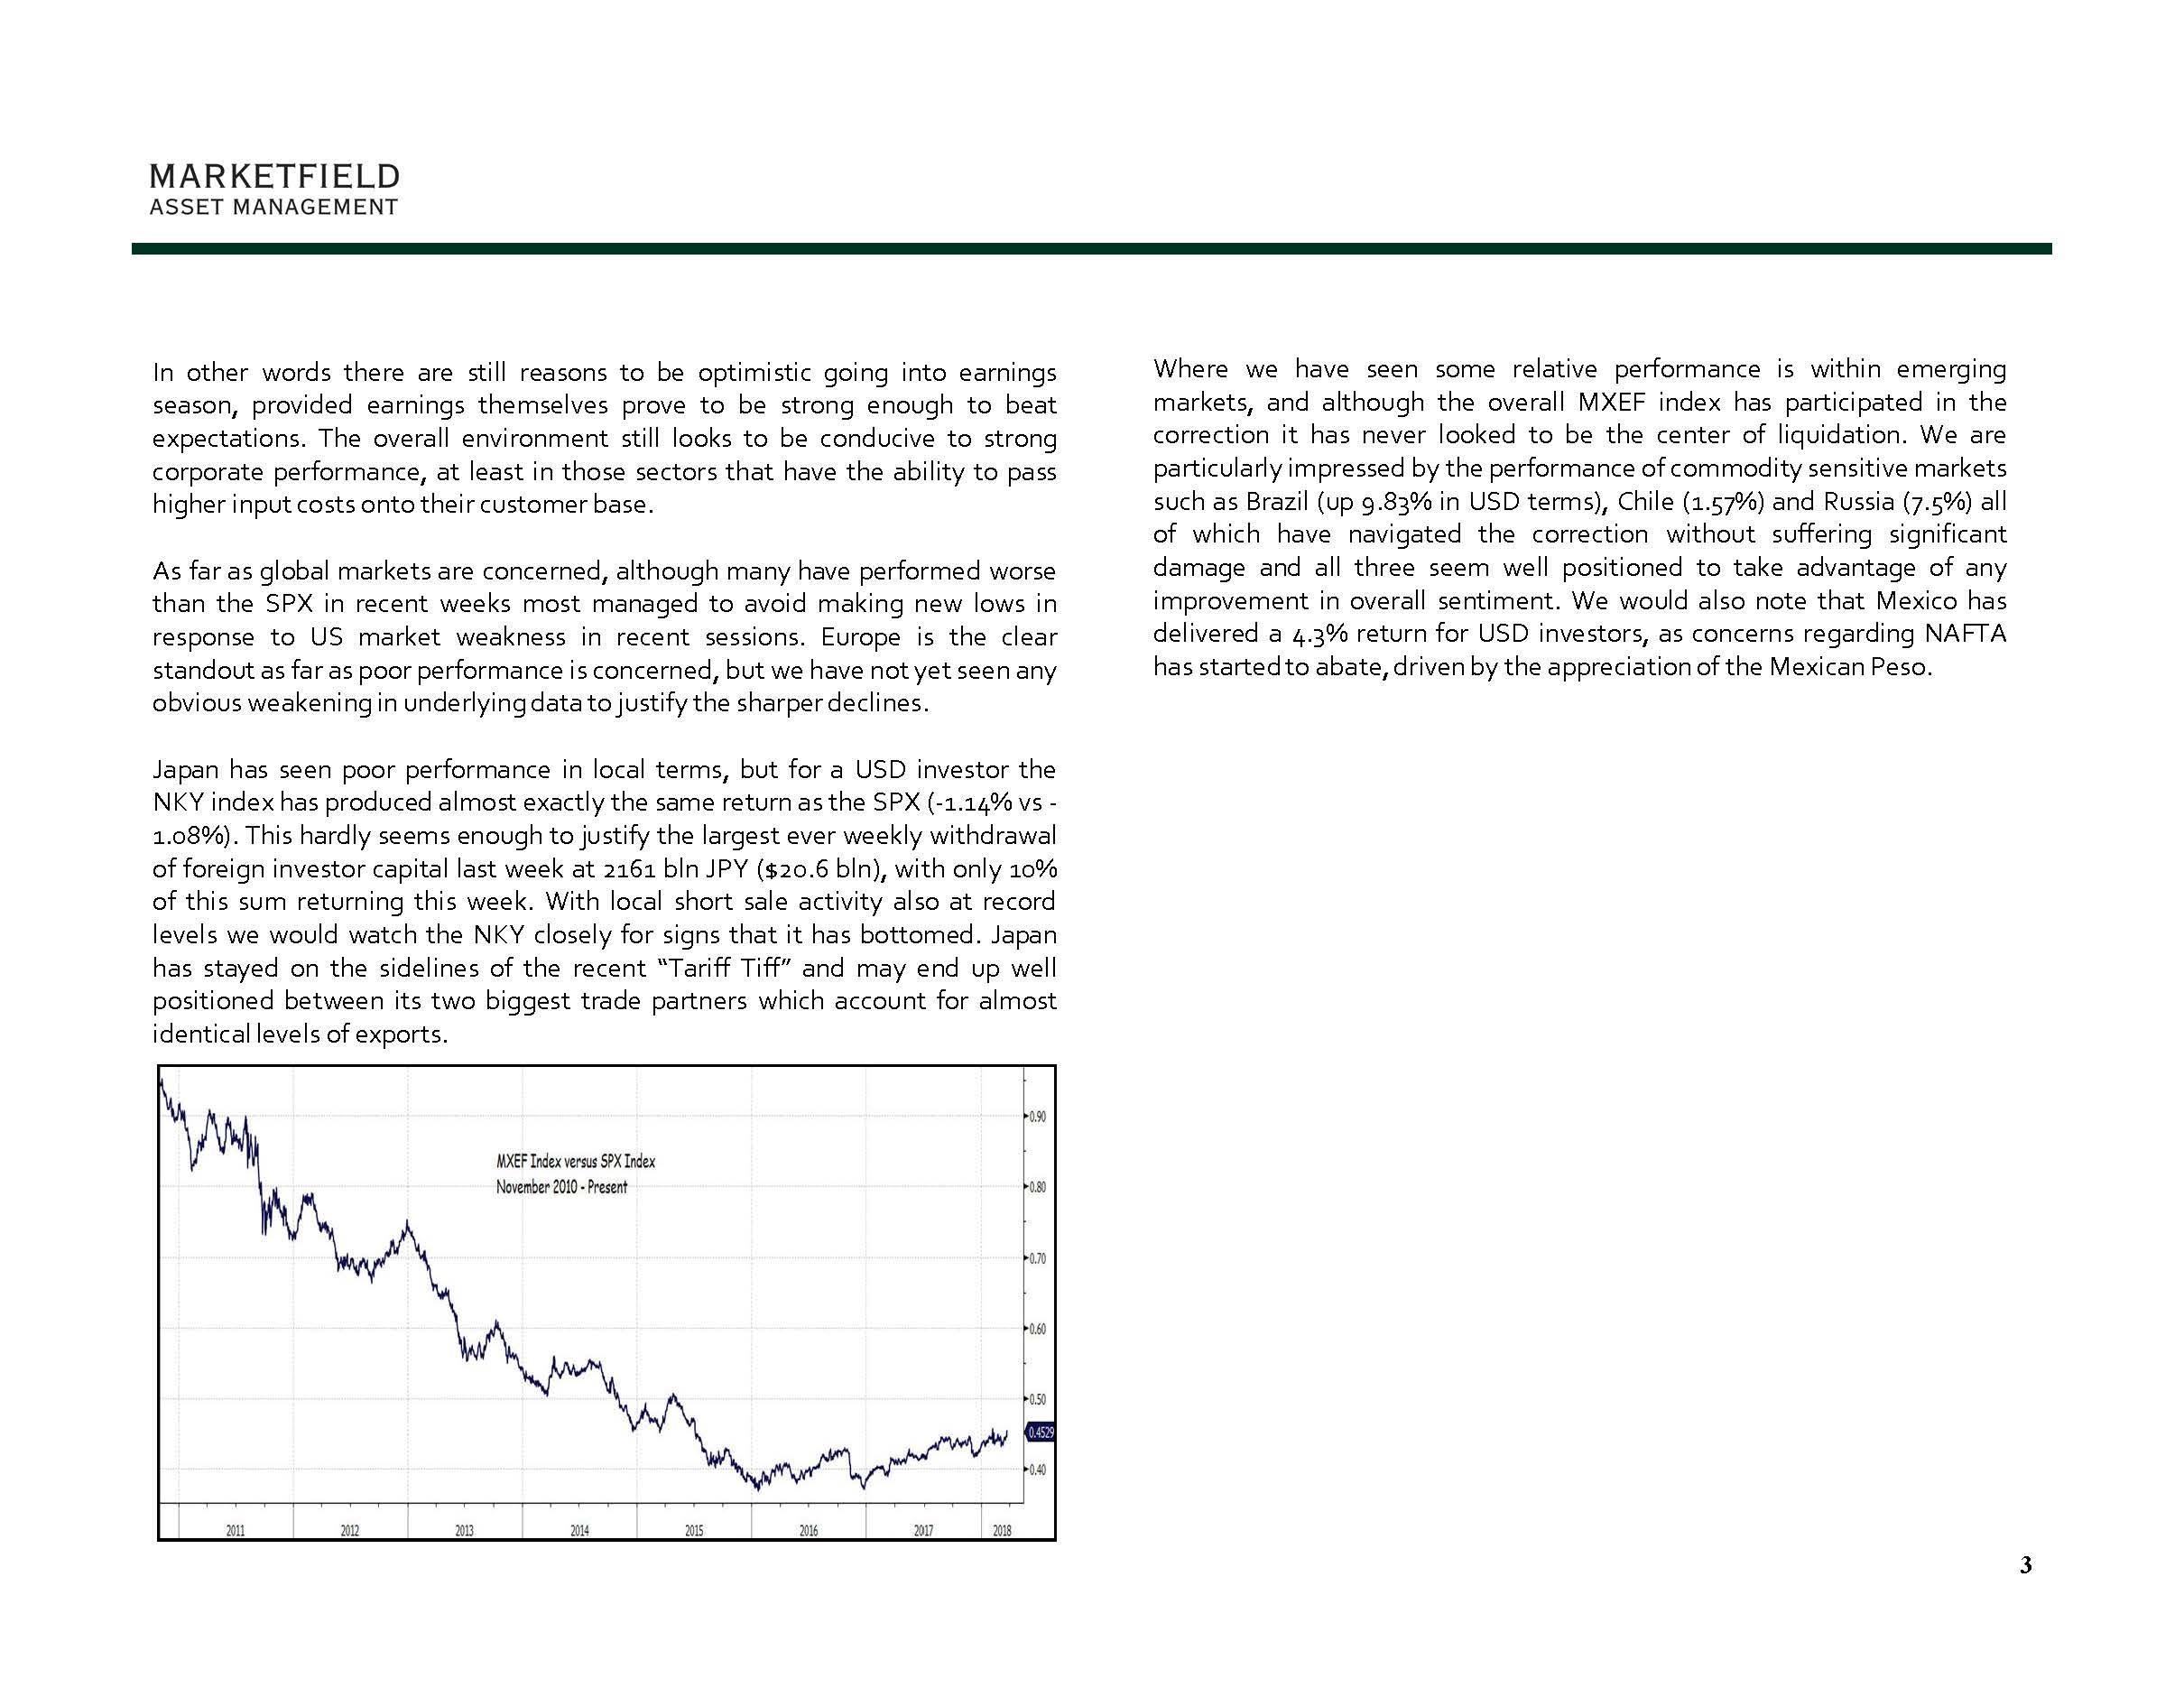 April 5_Marketfield Weekly Speculator_Page_03.jpg